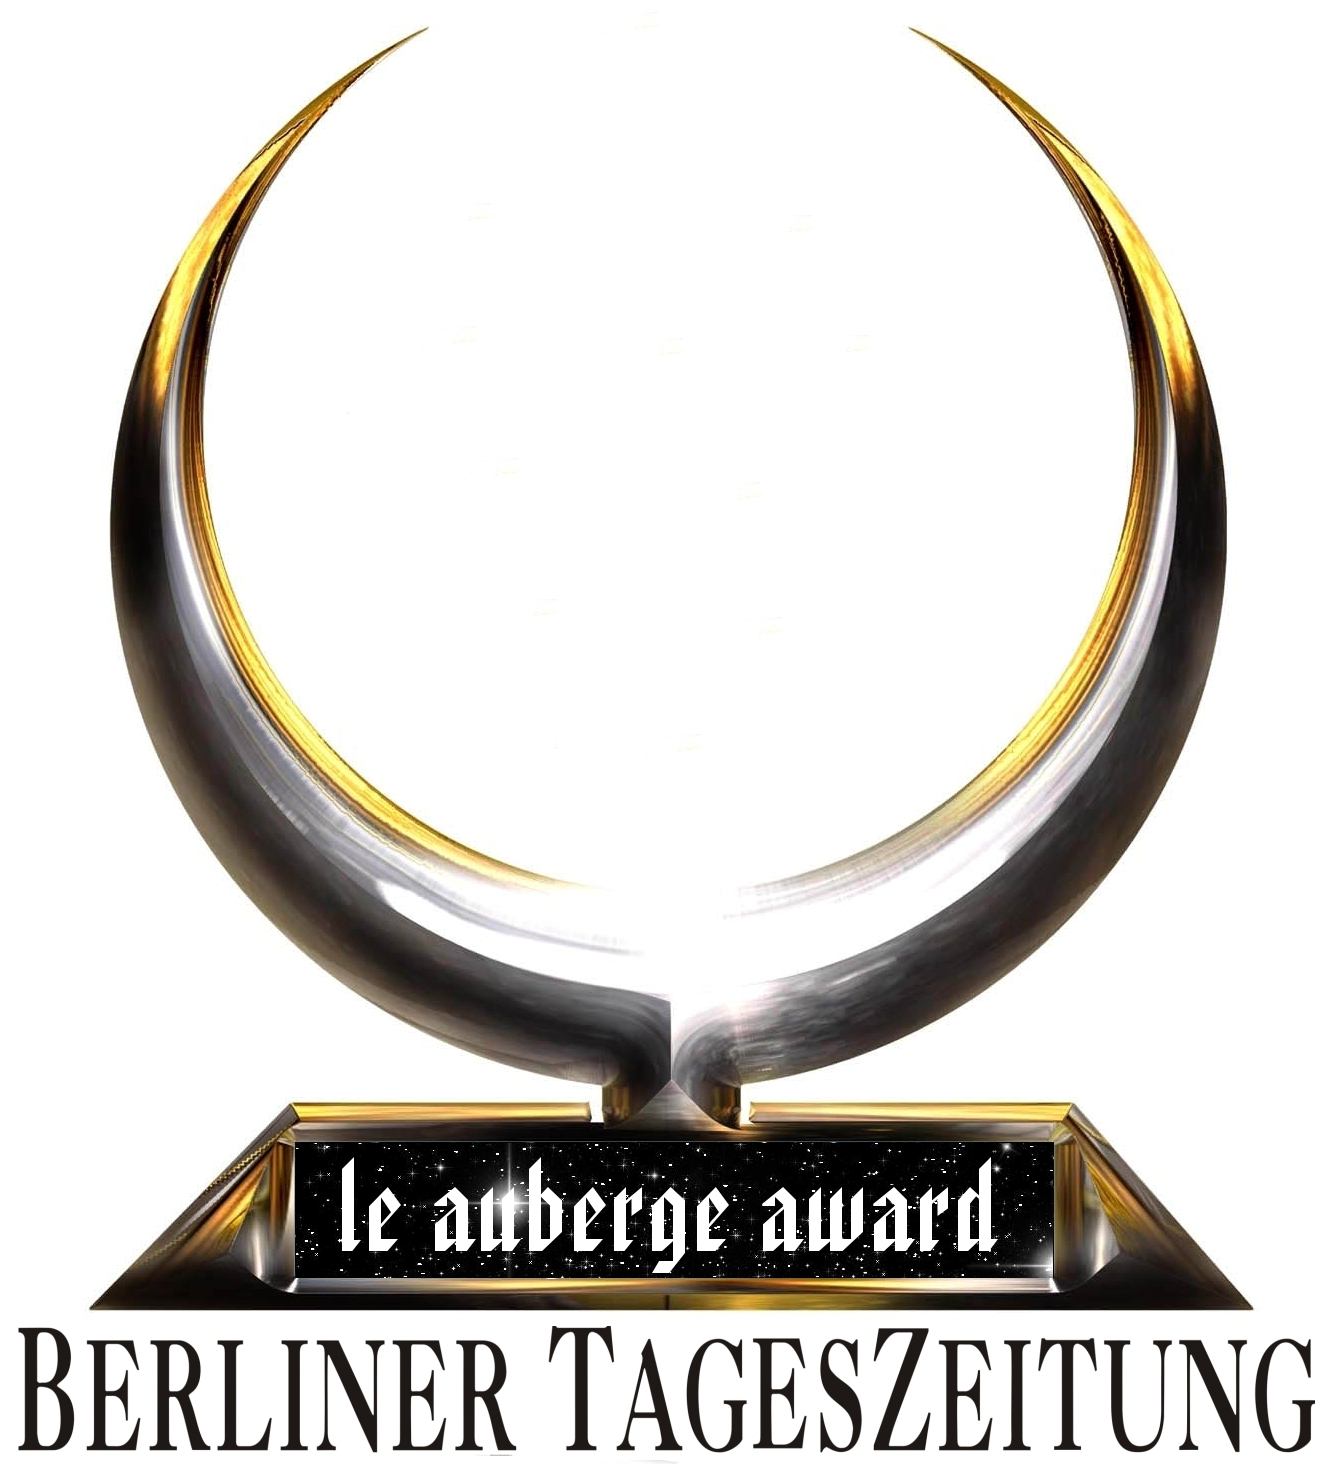 File:Auberge Award.png - Award PNG